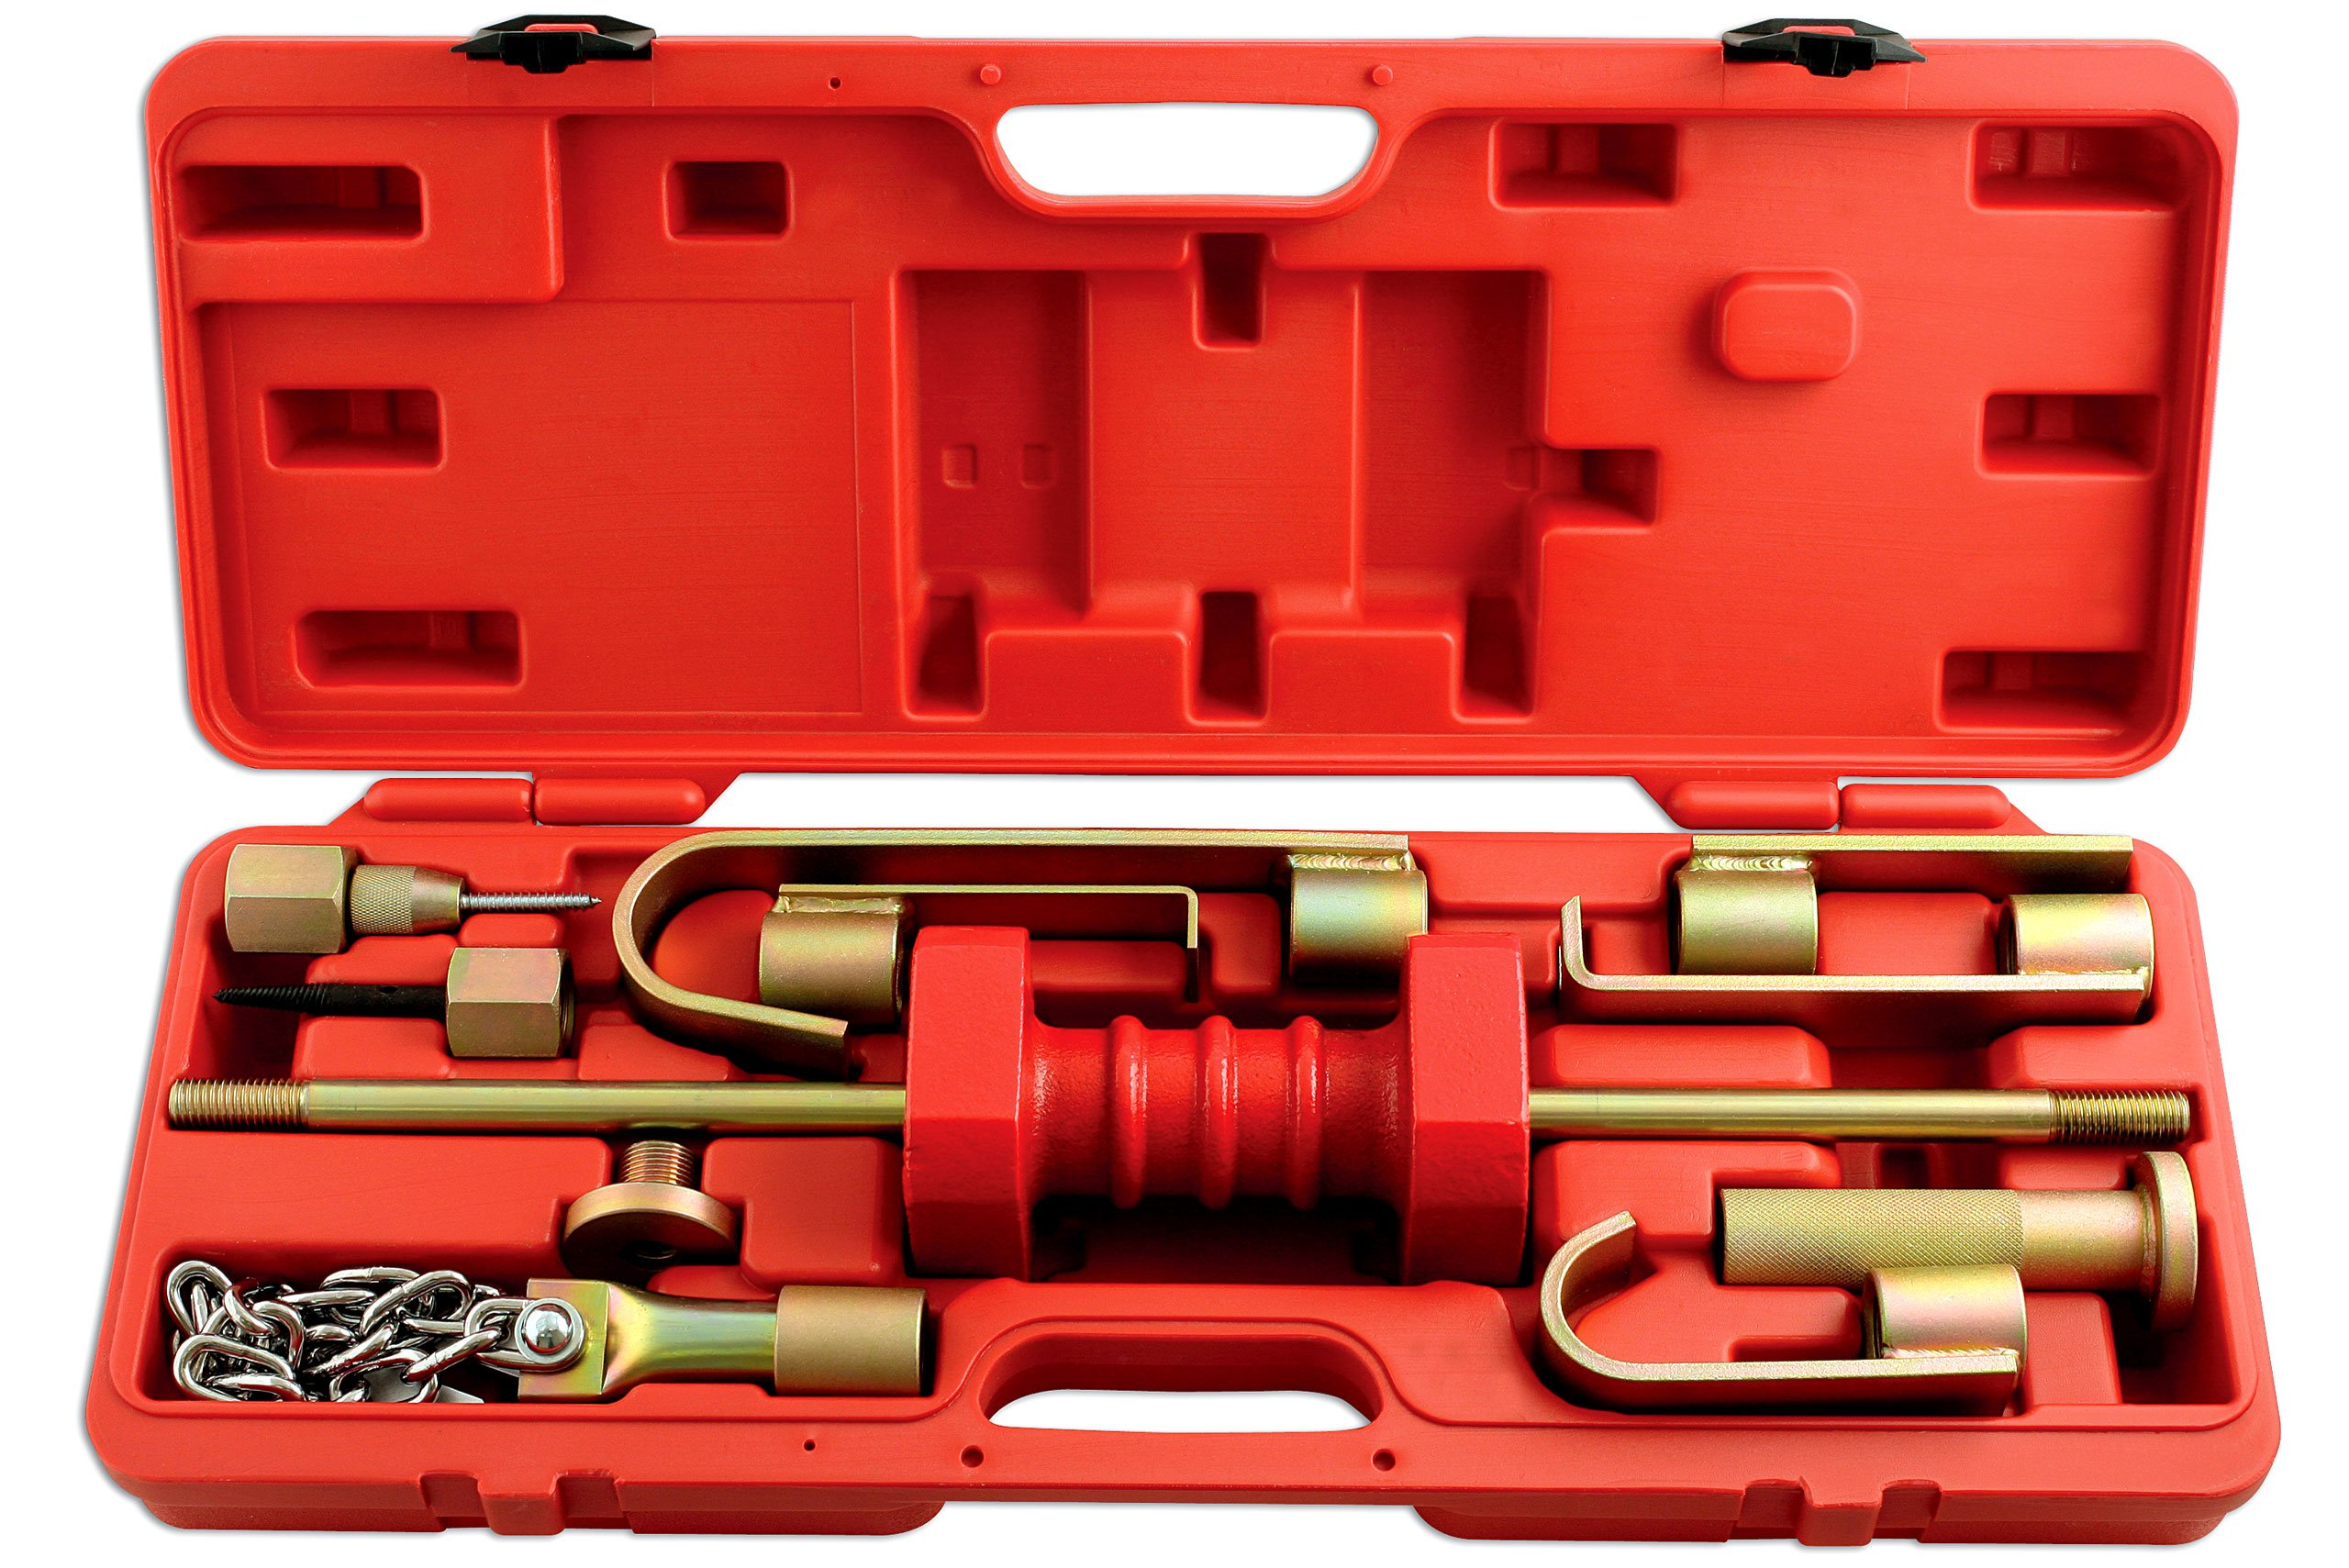 Power-Tec - 92297 Bodywork Slide Hammer Set 5.4kgs by POWERTEC (Image #1)